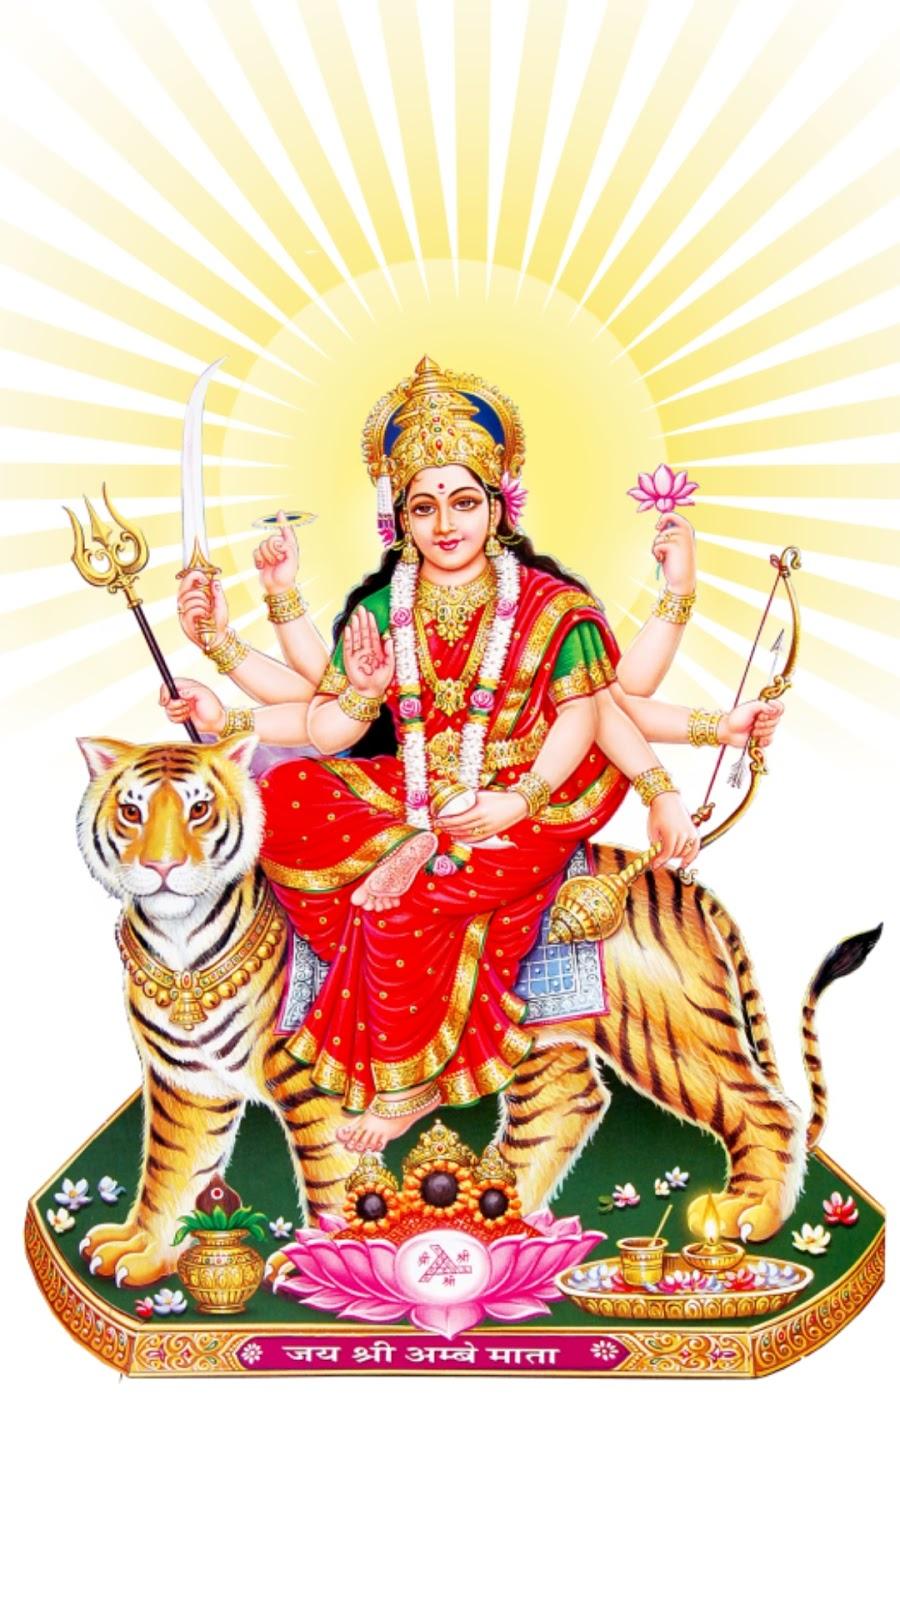 म दरग मबइल वलपपर Hd Maa Durga